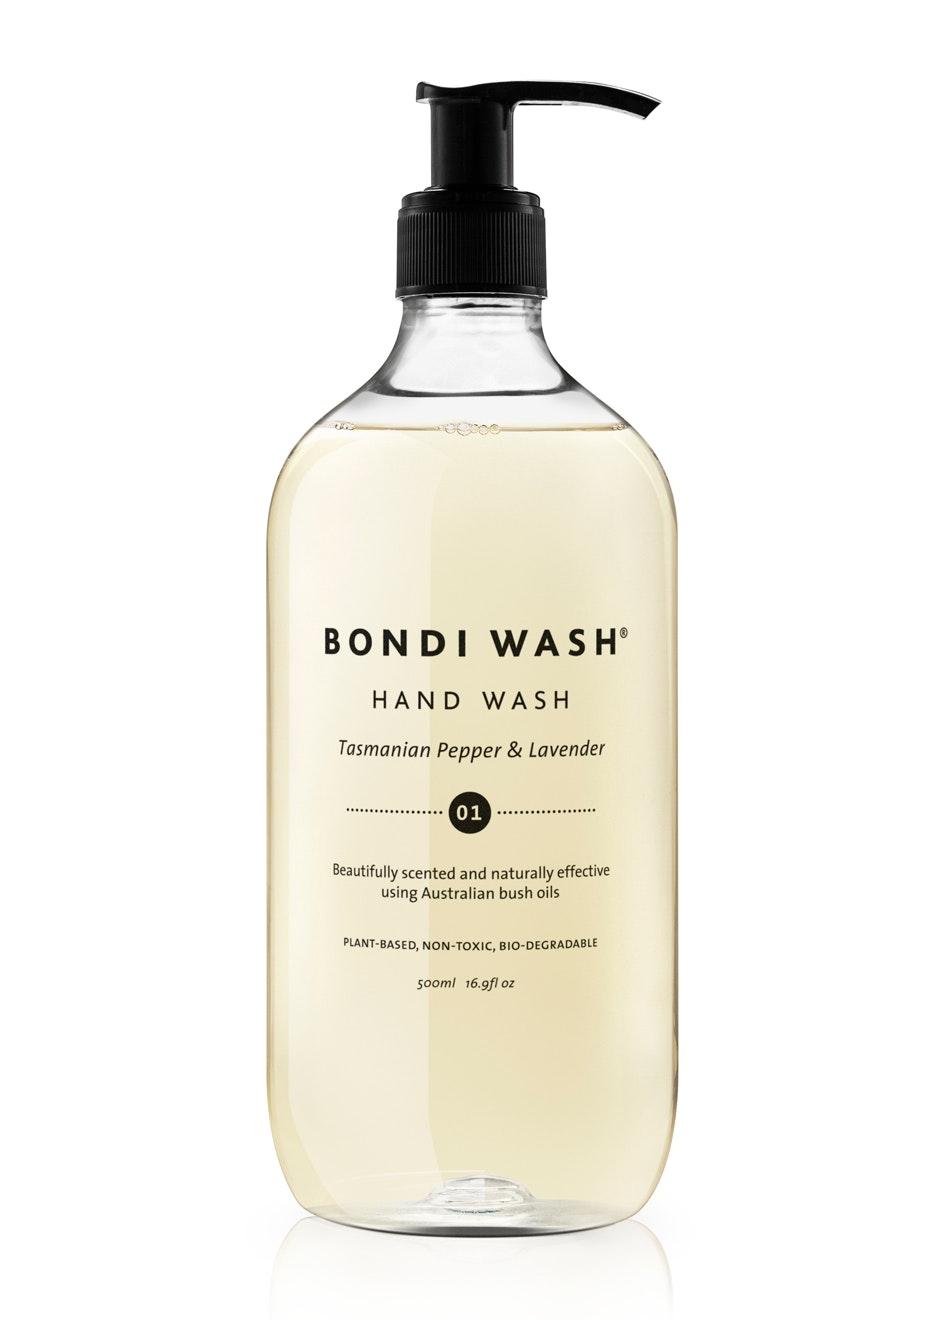 Bondi Wash - Hand Wash Tasmanian Pepper & Lavender 500ml